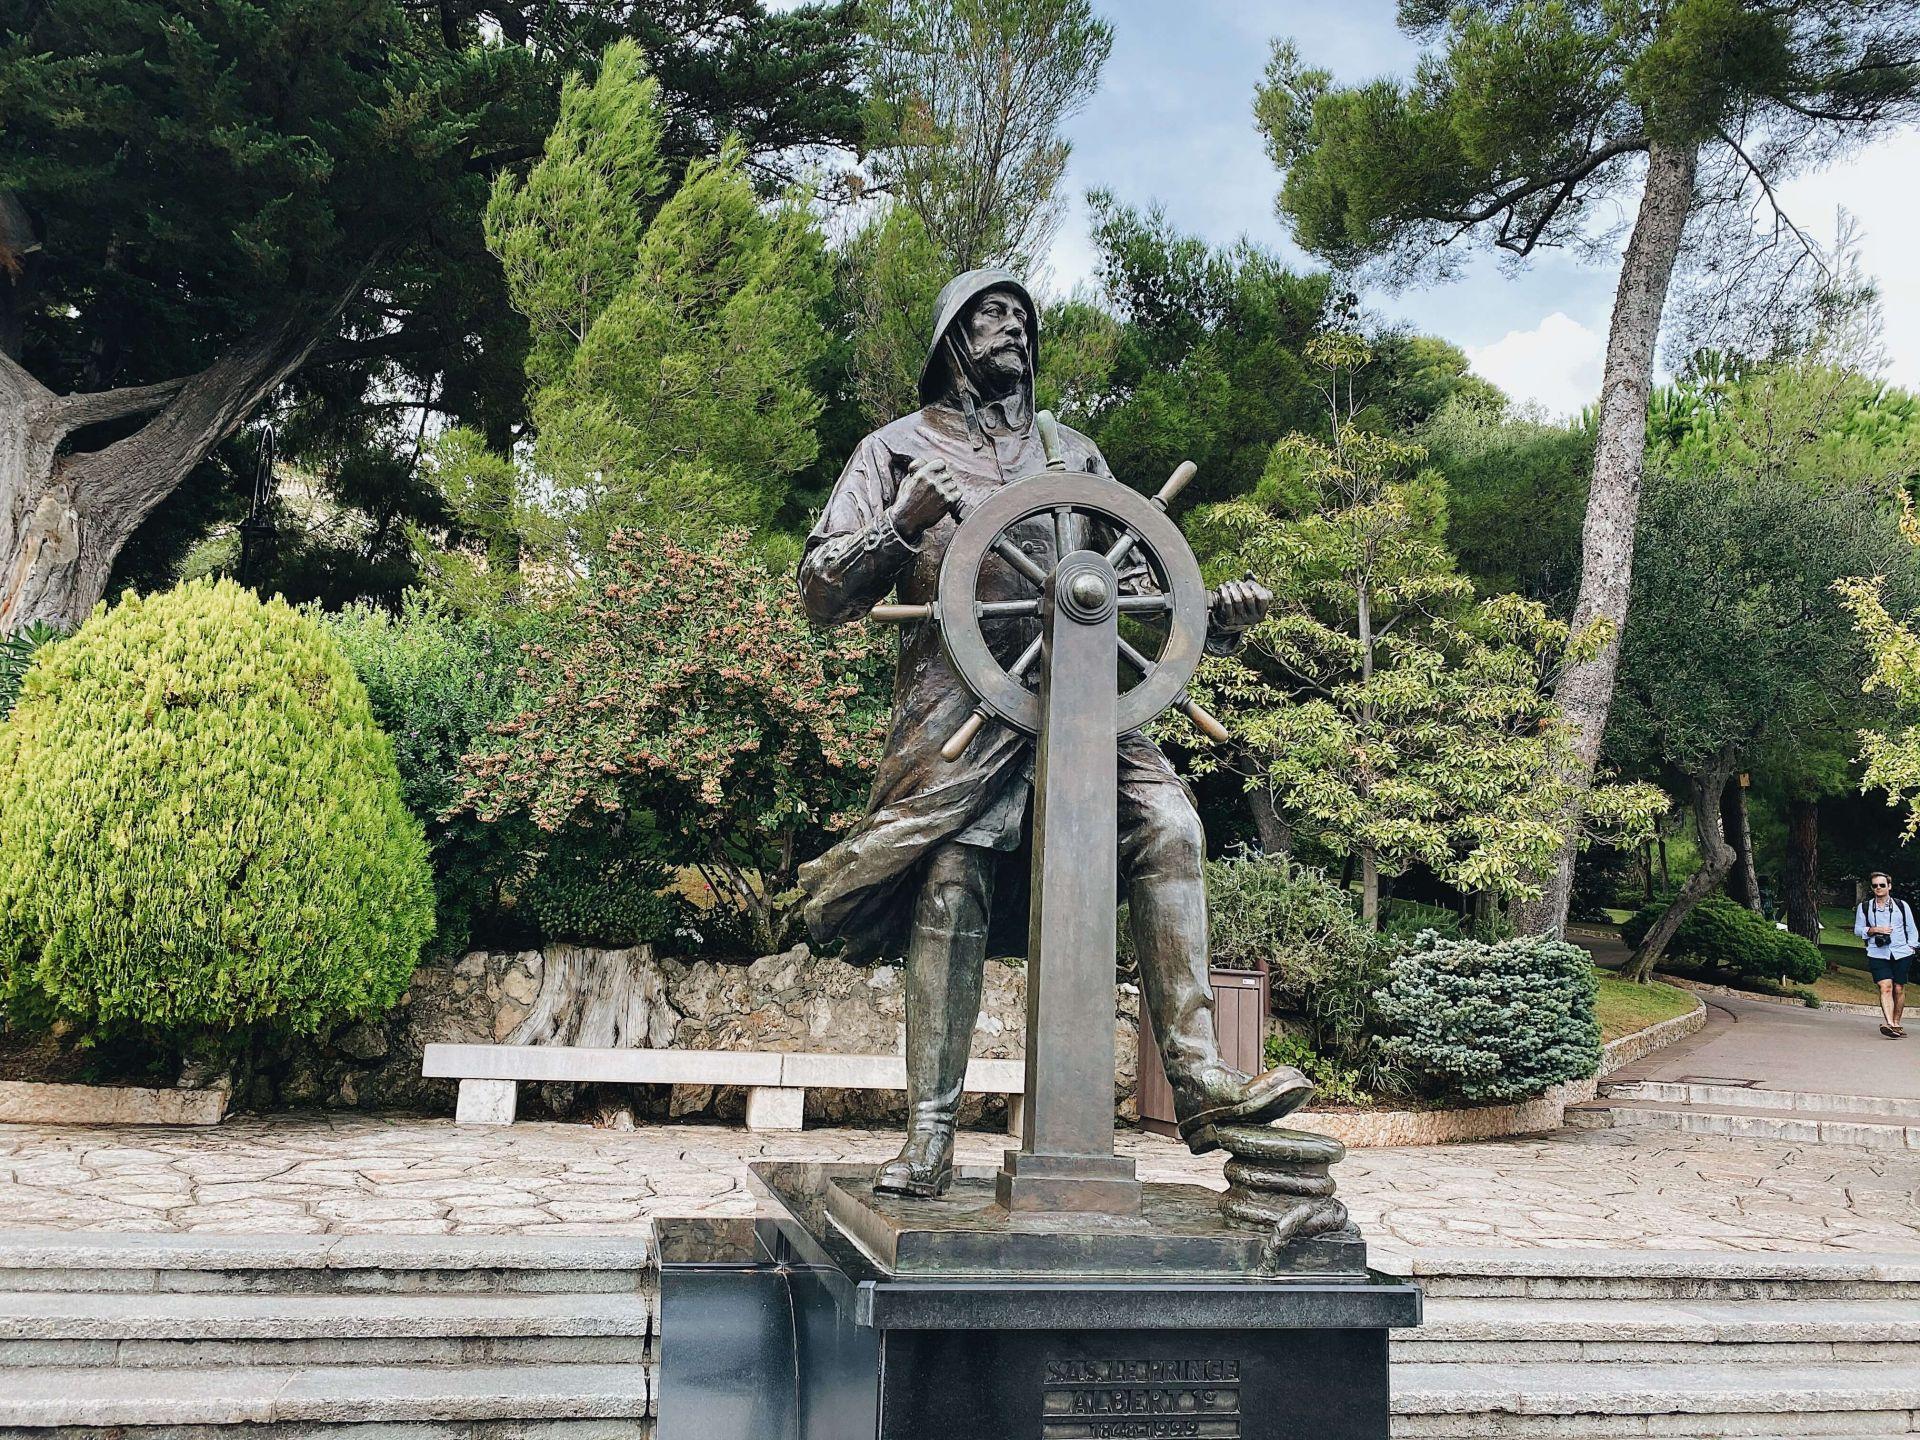 Jardin de Saint-Martin Monaco Day trip itinerary